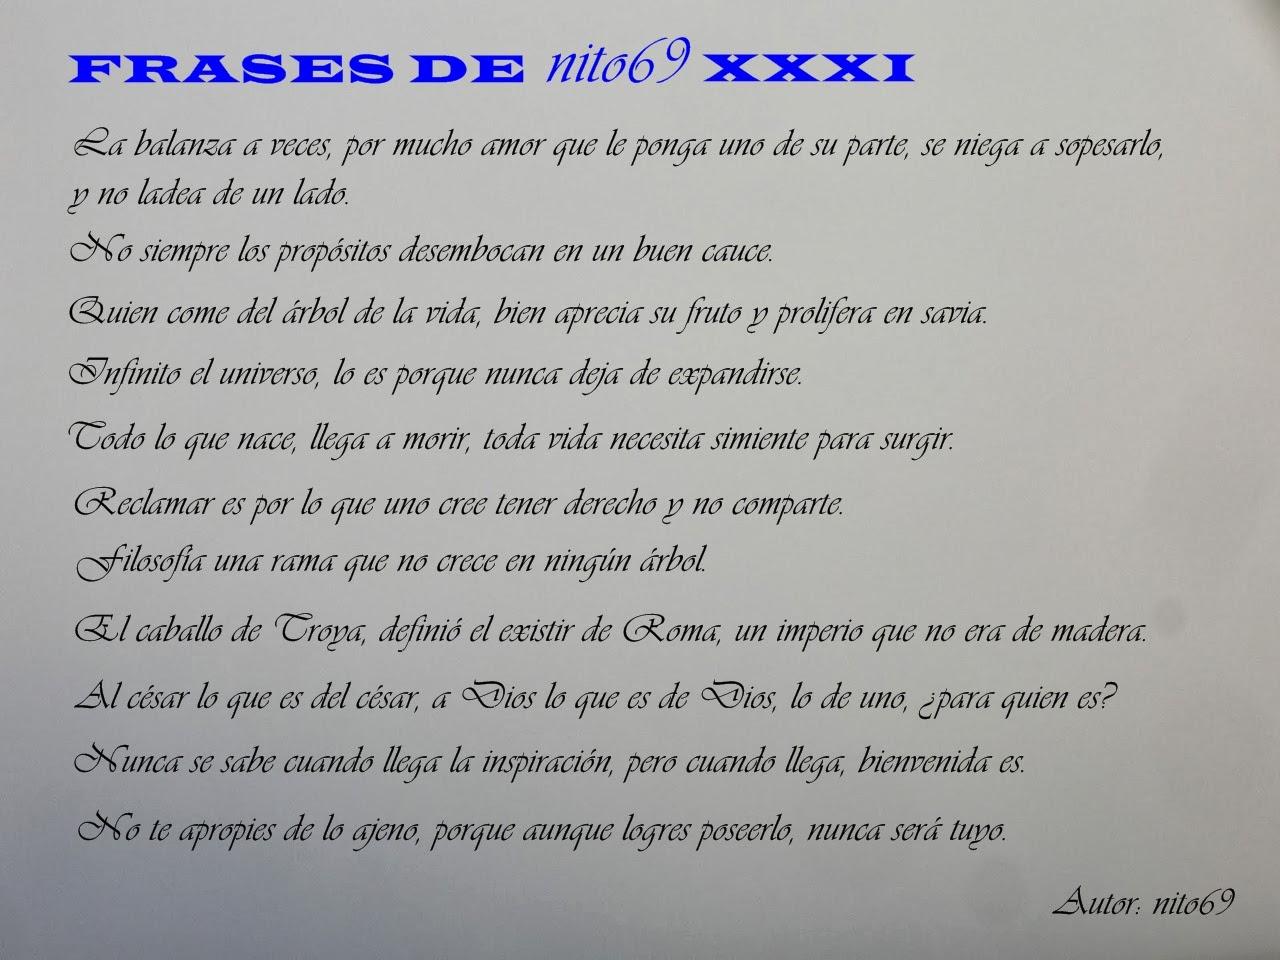 FRASES DE nito69 XXXI